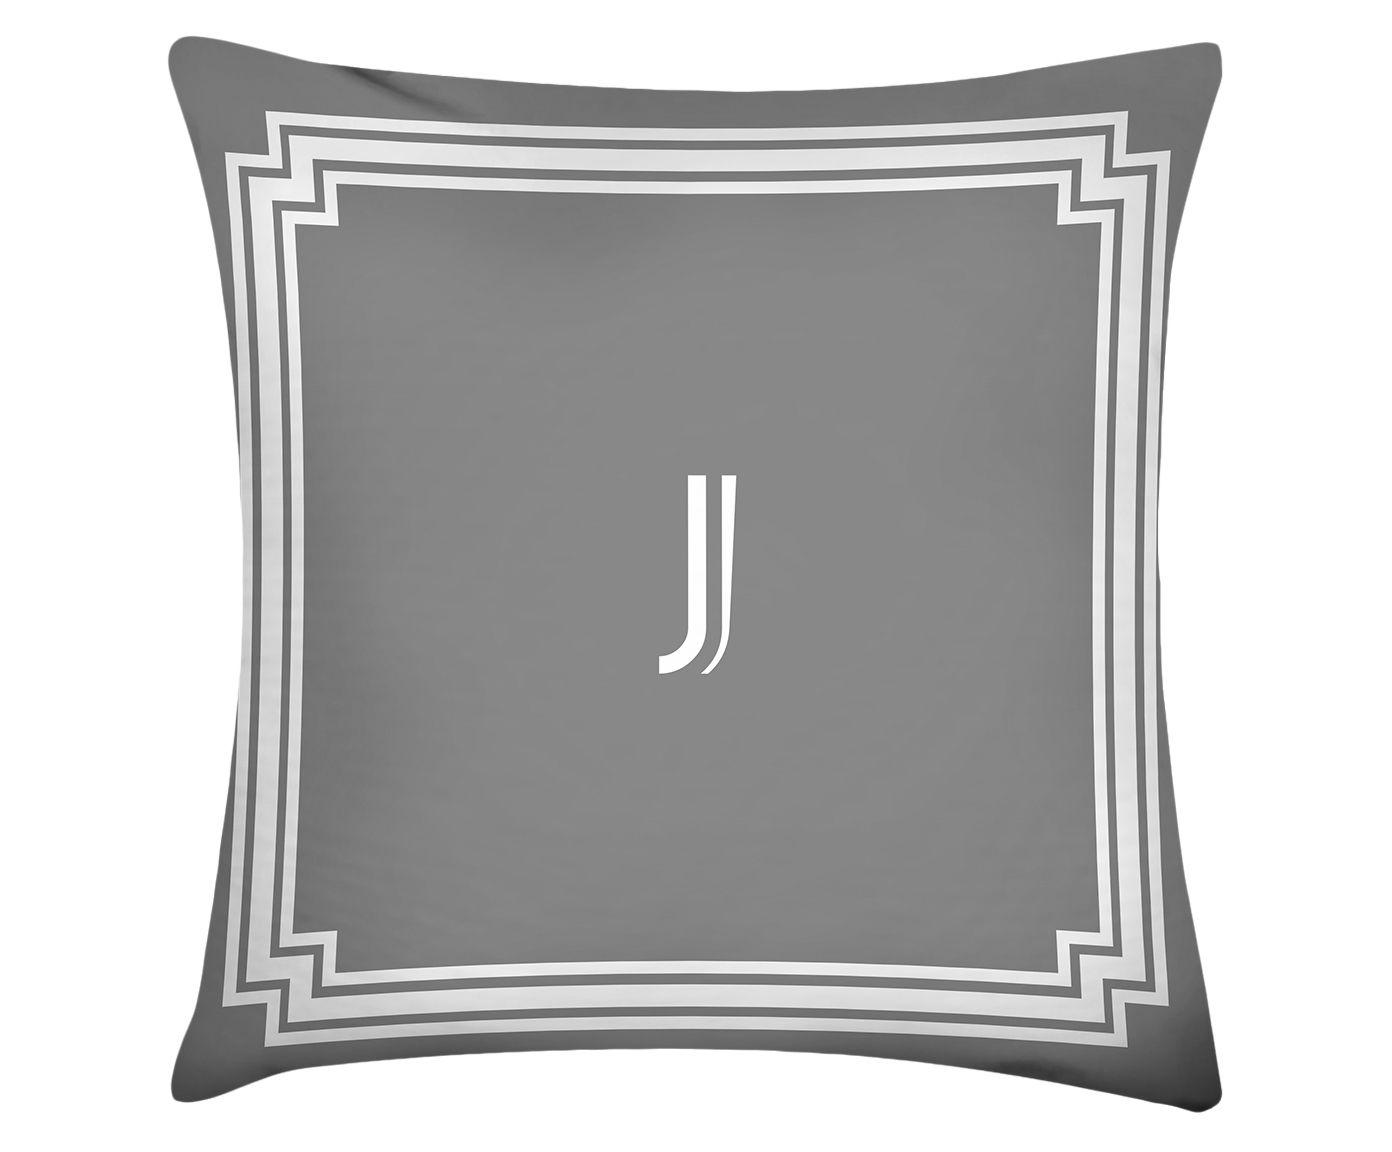 Almofada Letter J - 45x45cm | Westwing.com.br